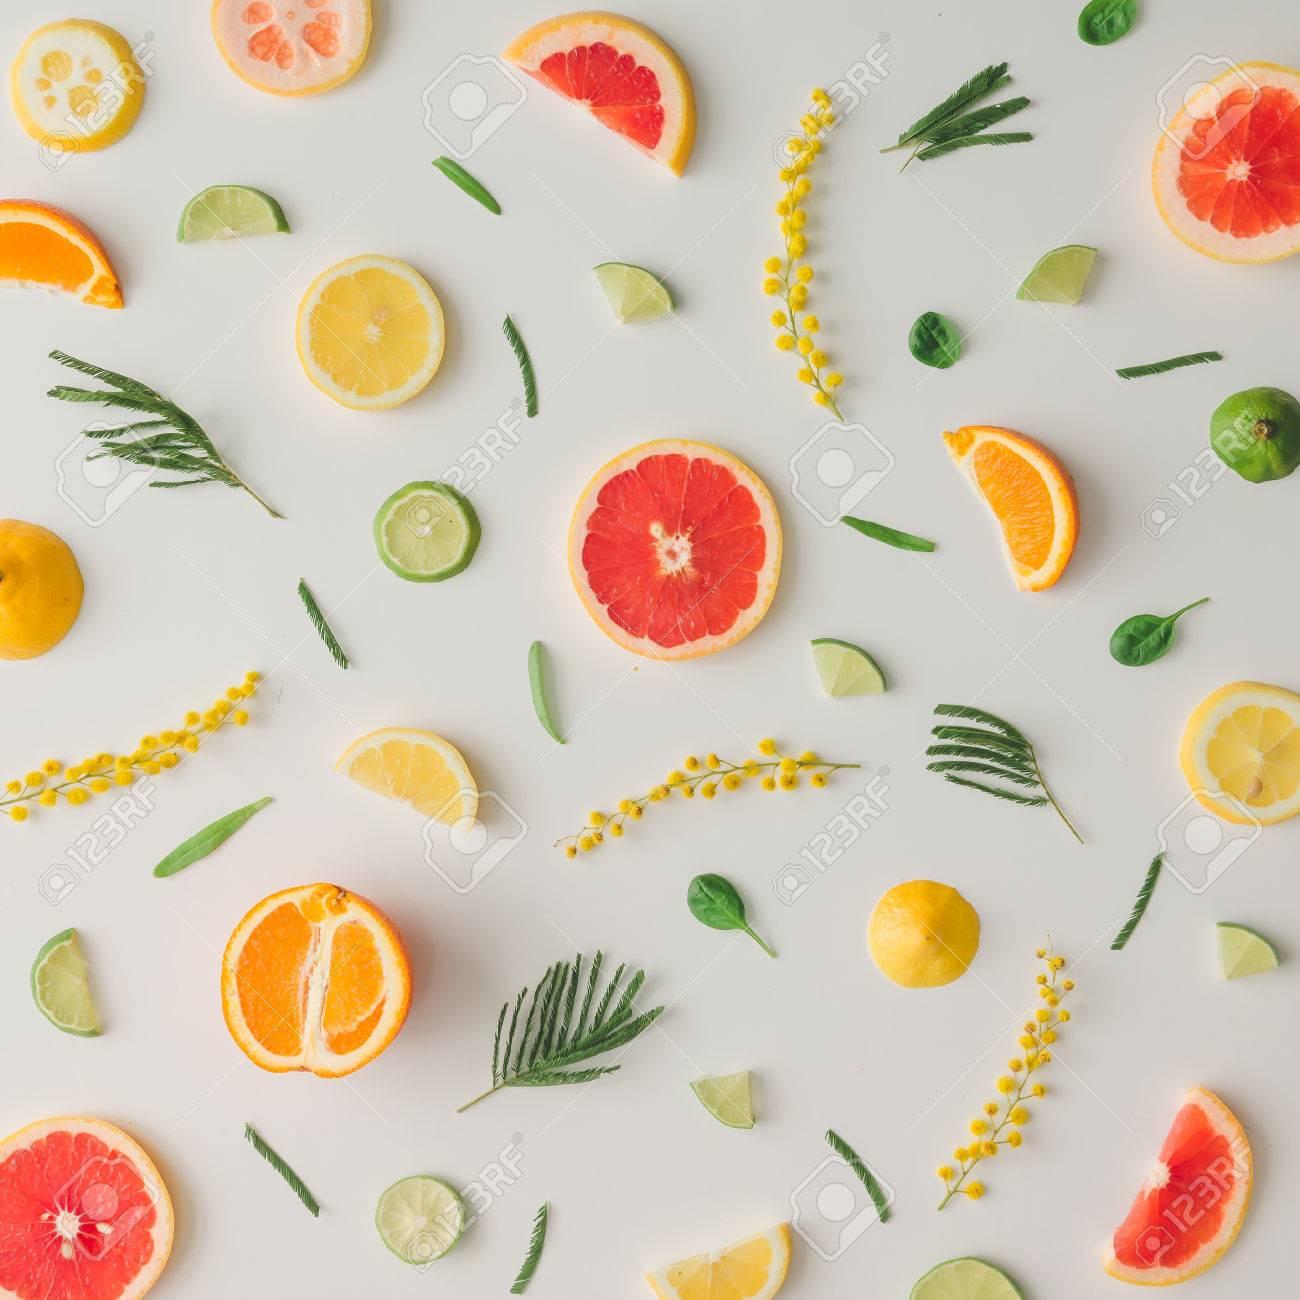 Colorful food pattern made of lemon, orange, grapefruit and flowers. Flat lay. - 73341852